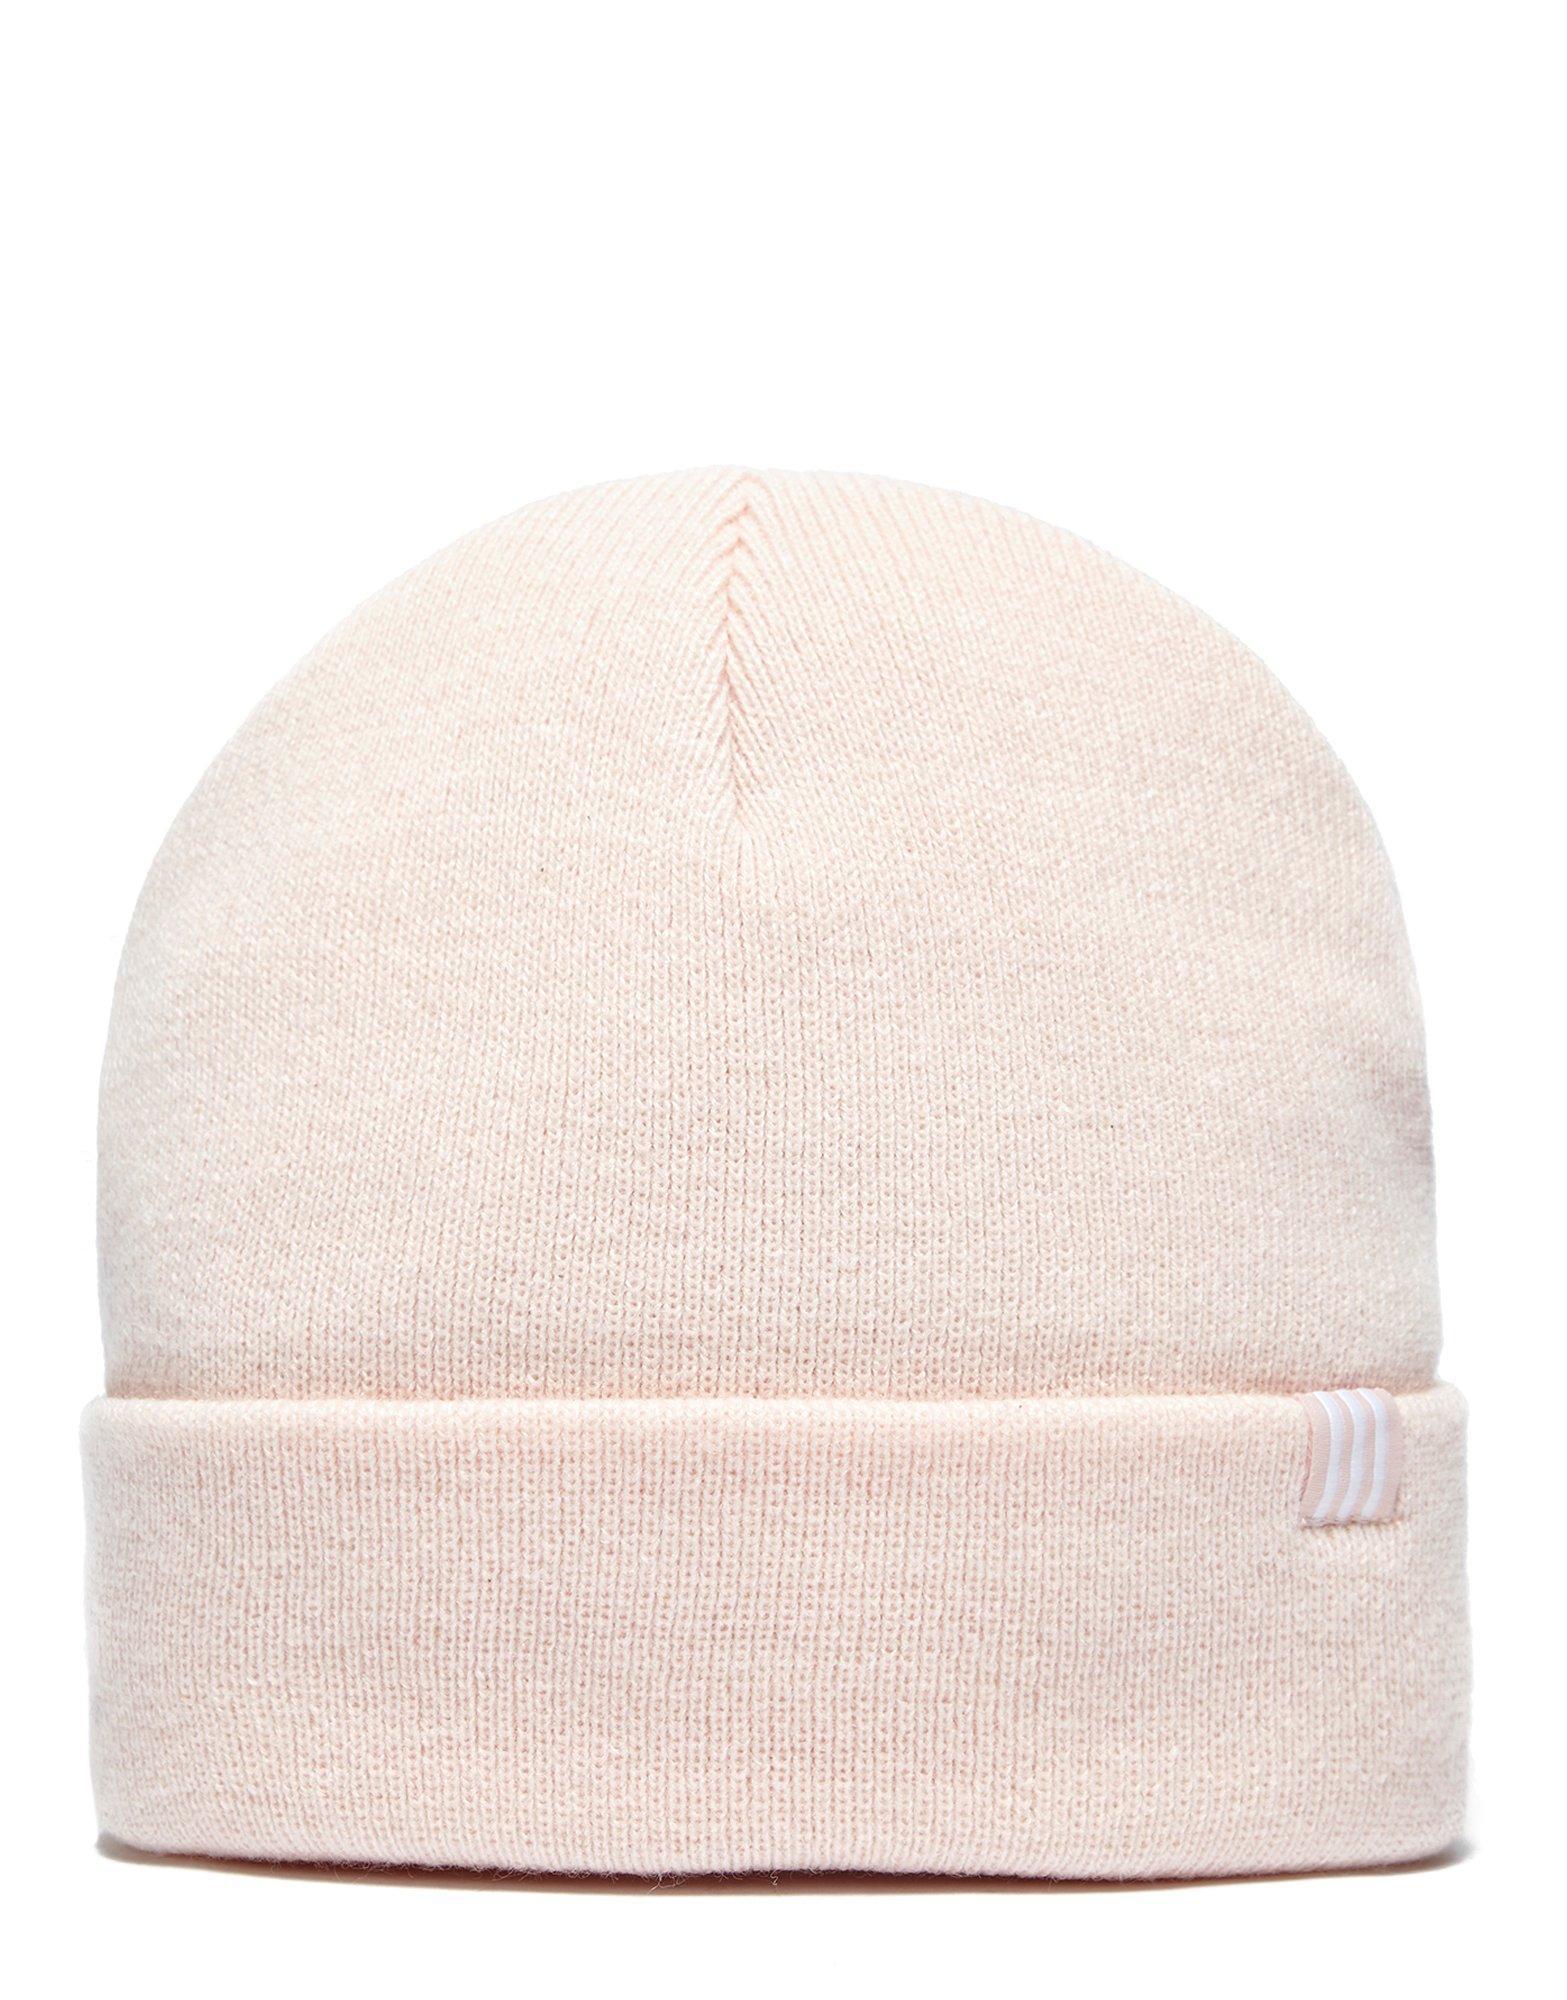 e500a0224b25e Lyst - adidas Originals Trefoil Beanie Hat in Pink for Men